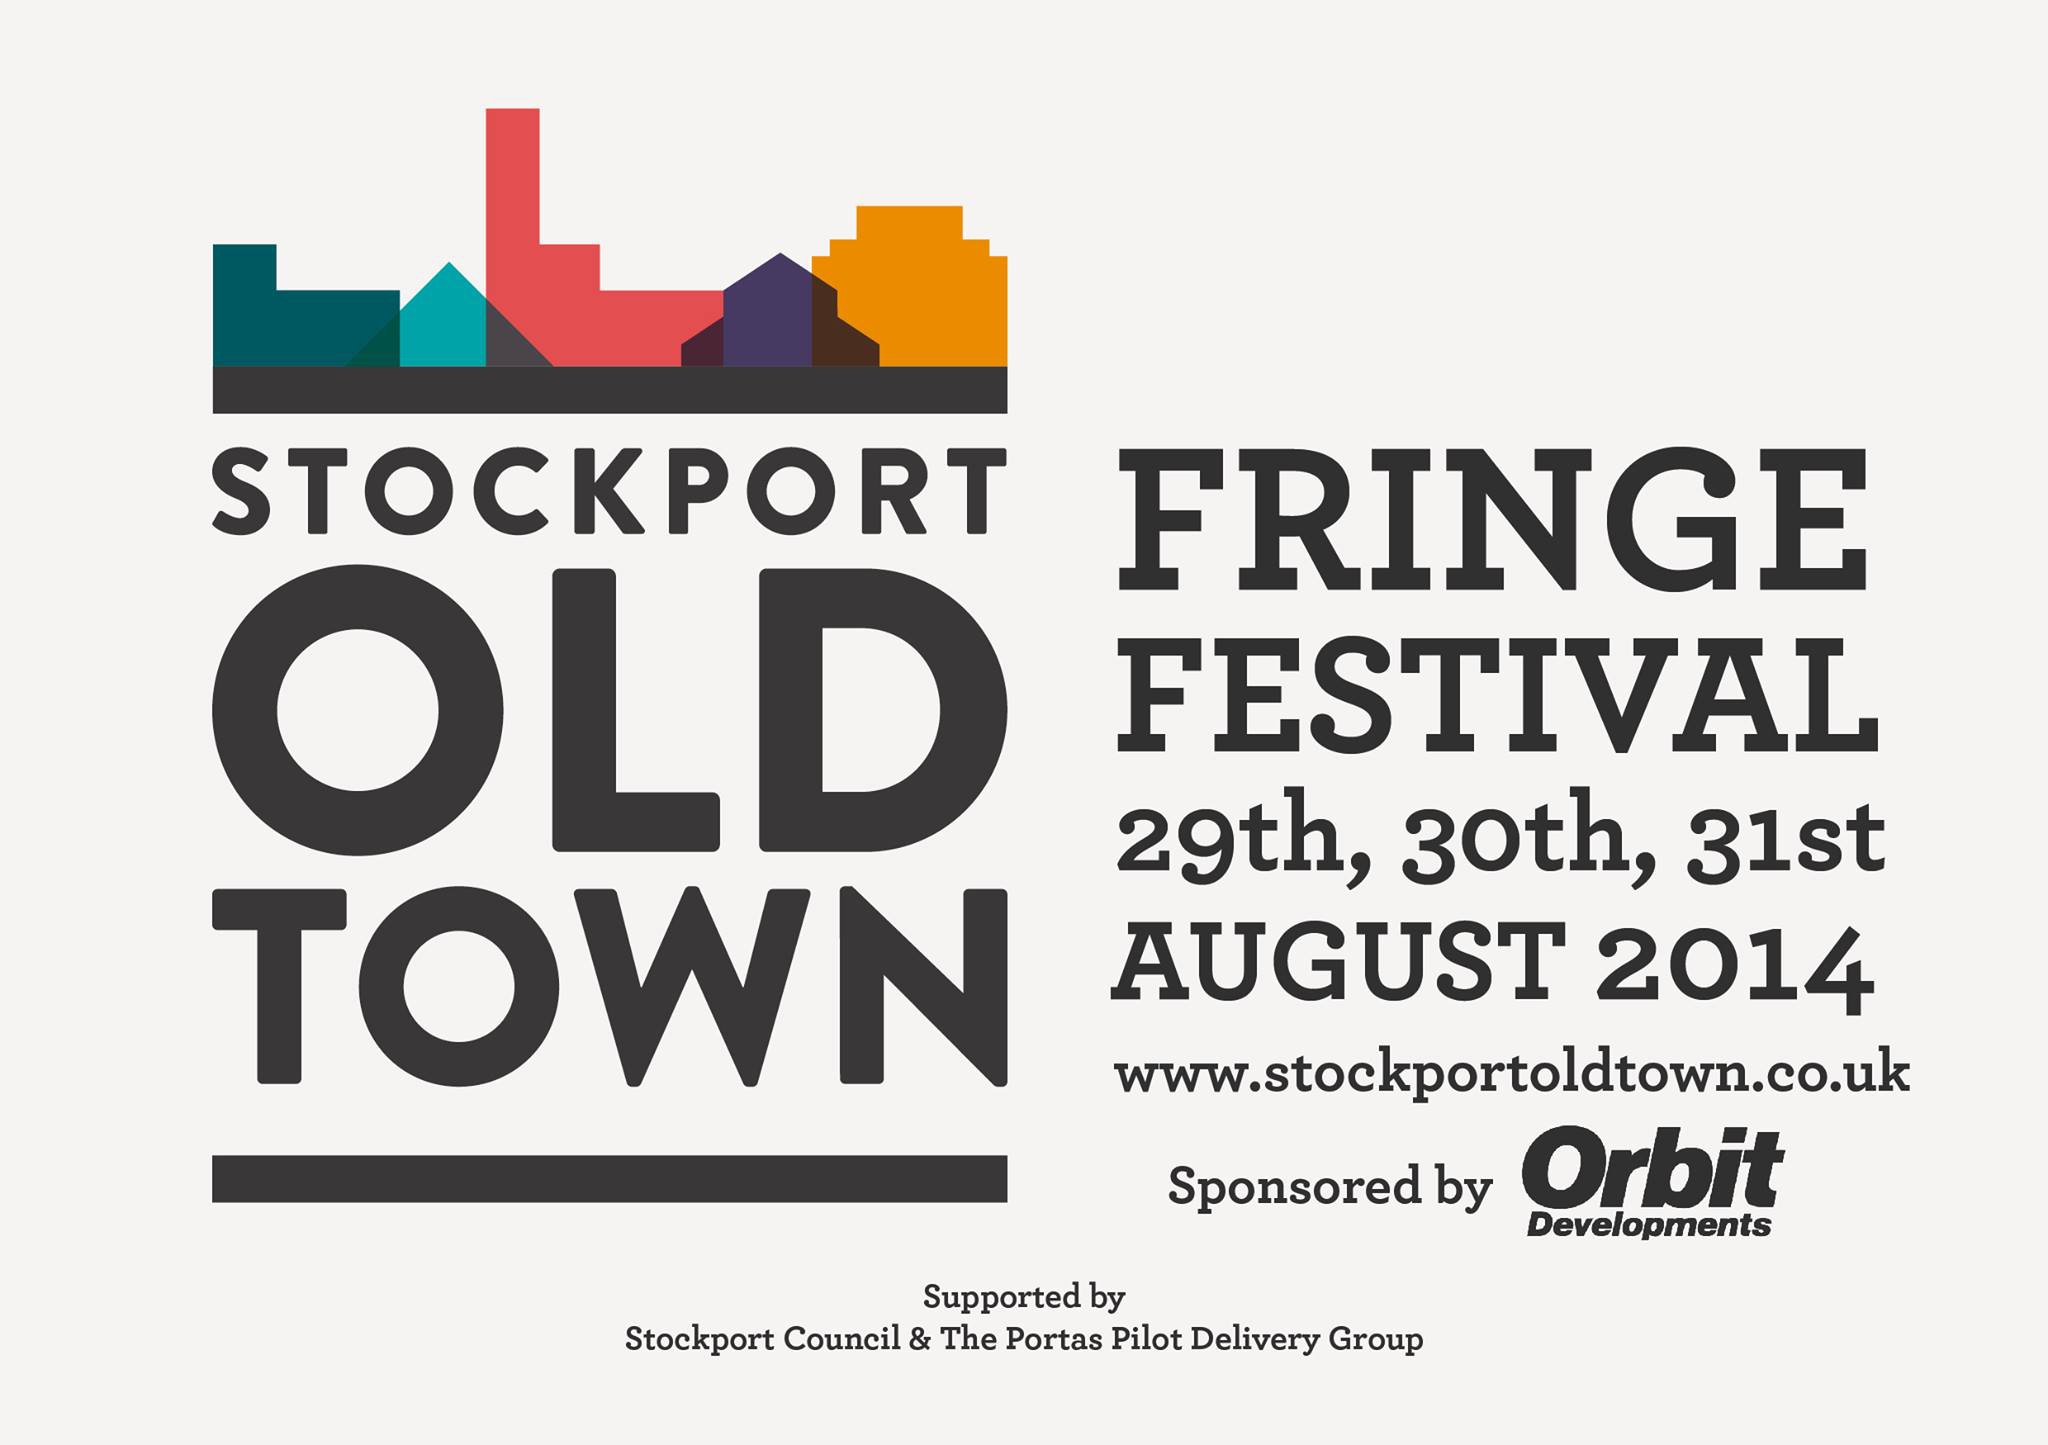 Stockport Old Town Fringe Festival